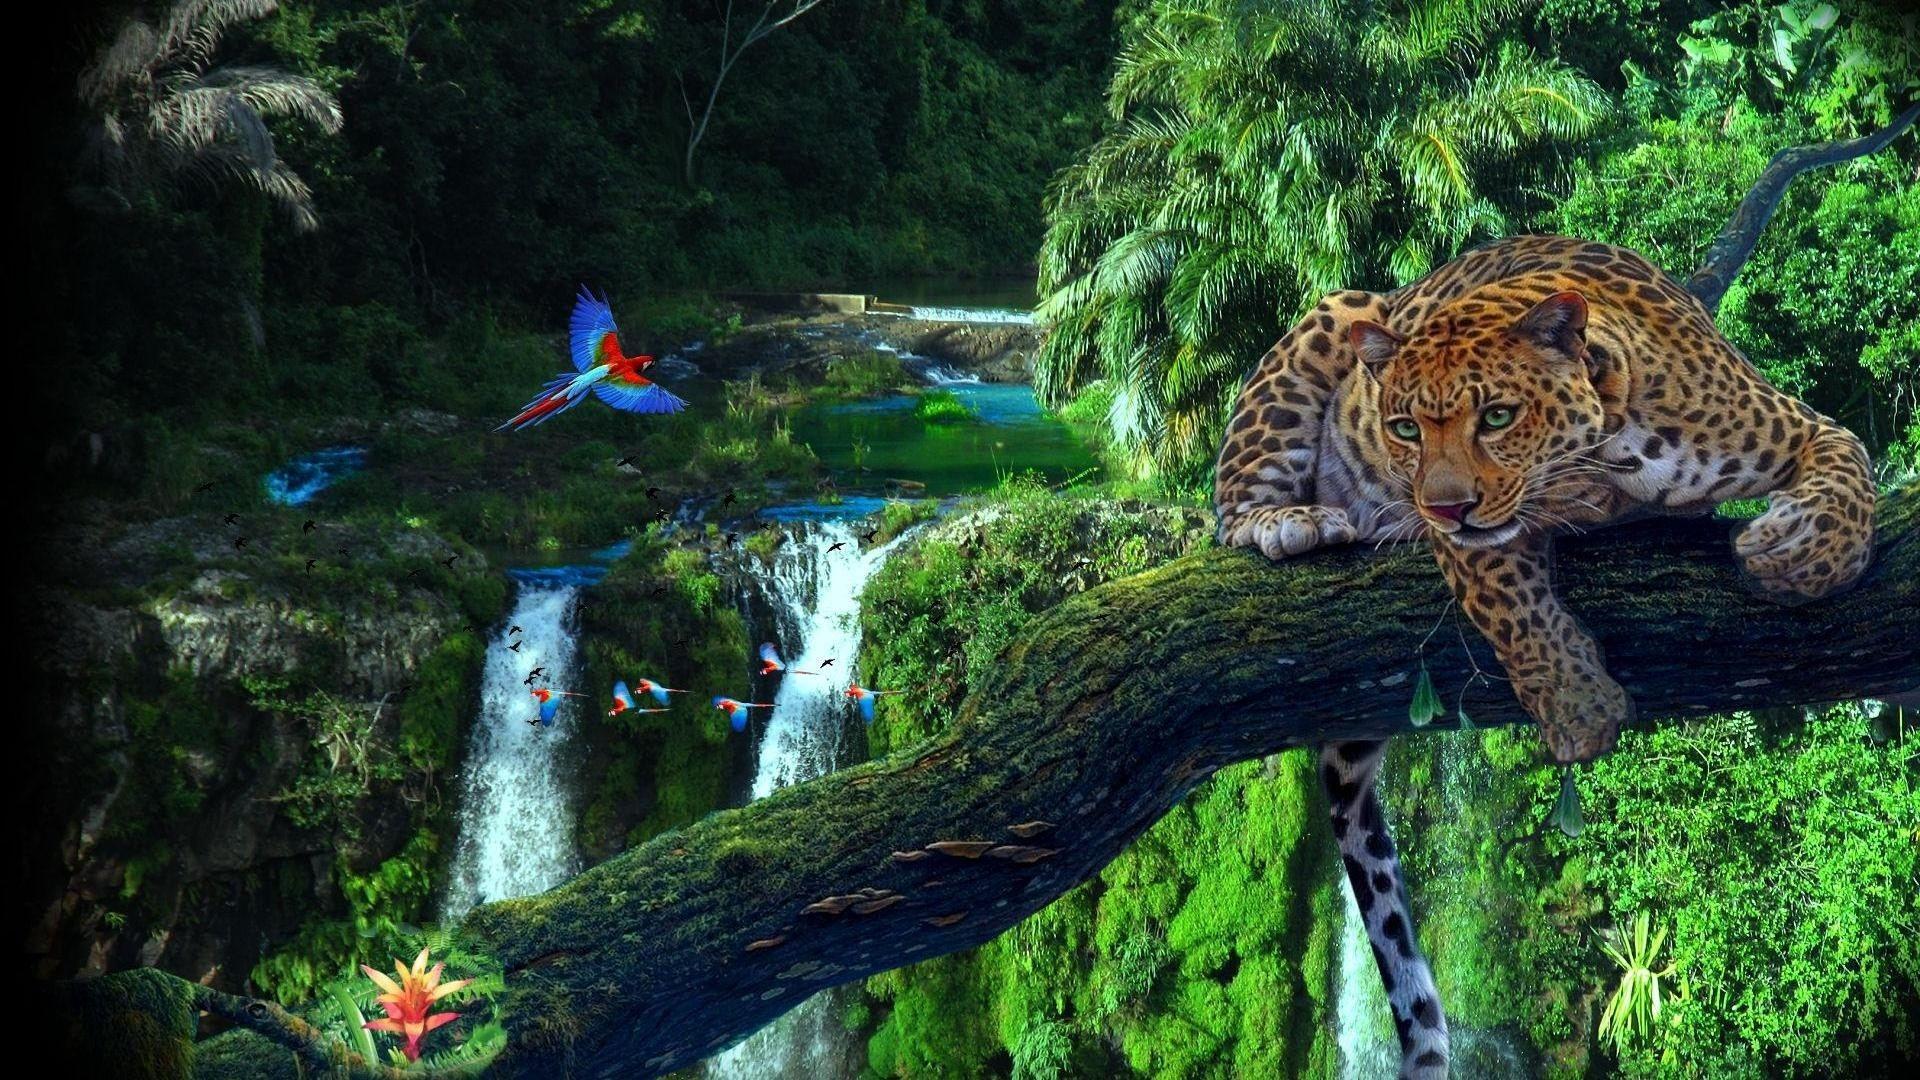 Amazon Rainforest Wallpaper Images vIM Rainforest